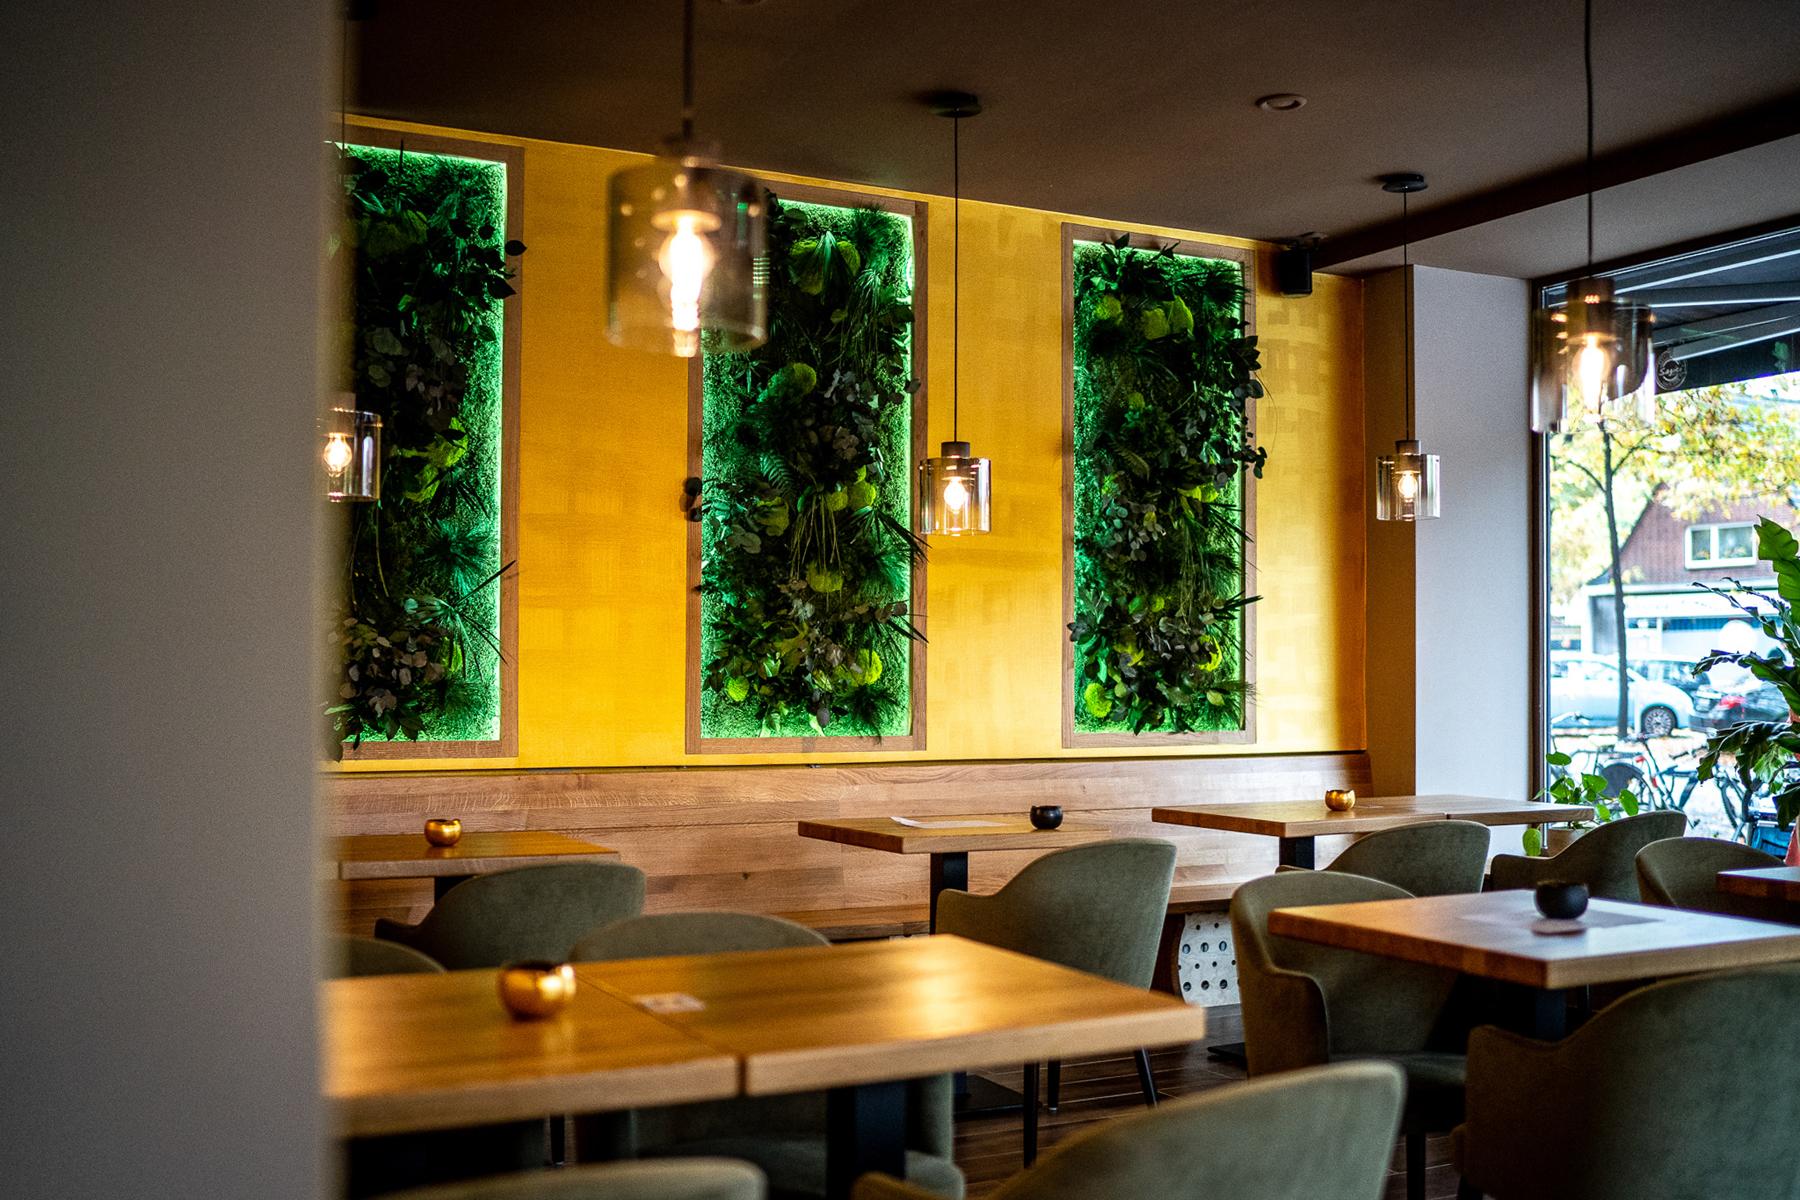 Geheimtipp Hamburg Winterhude Restaurant Bodhi Vegan Living 01